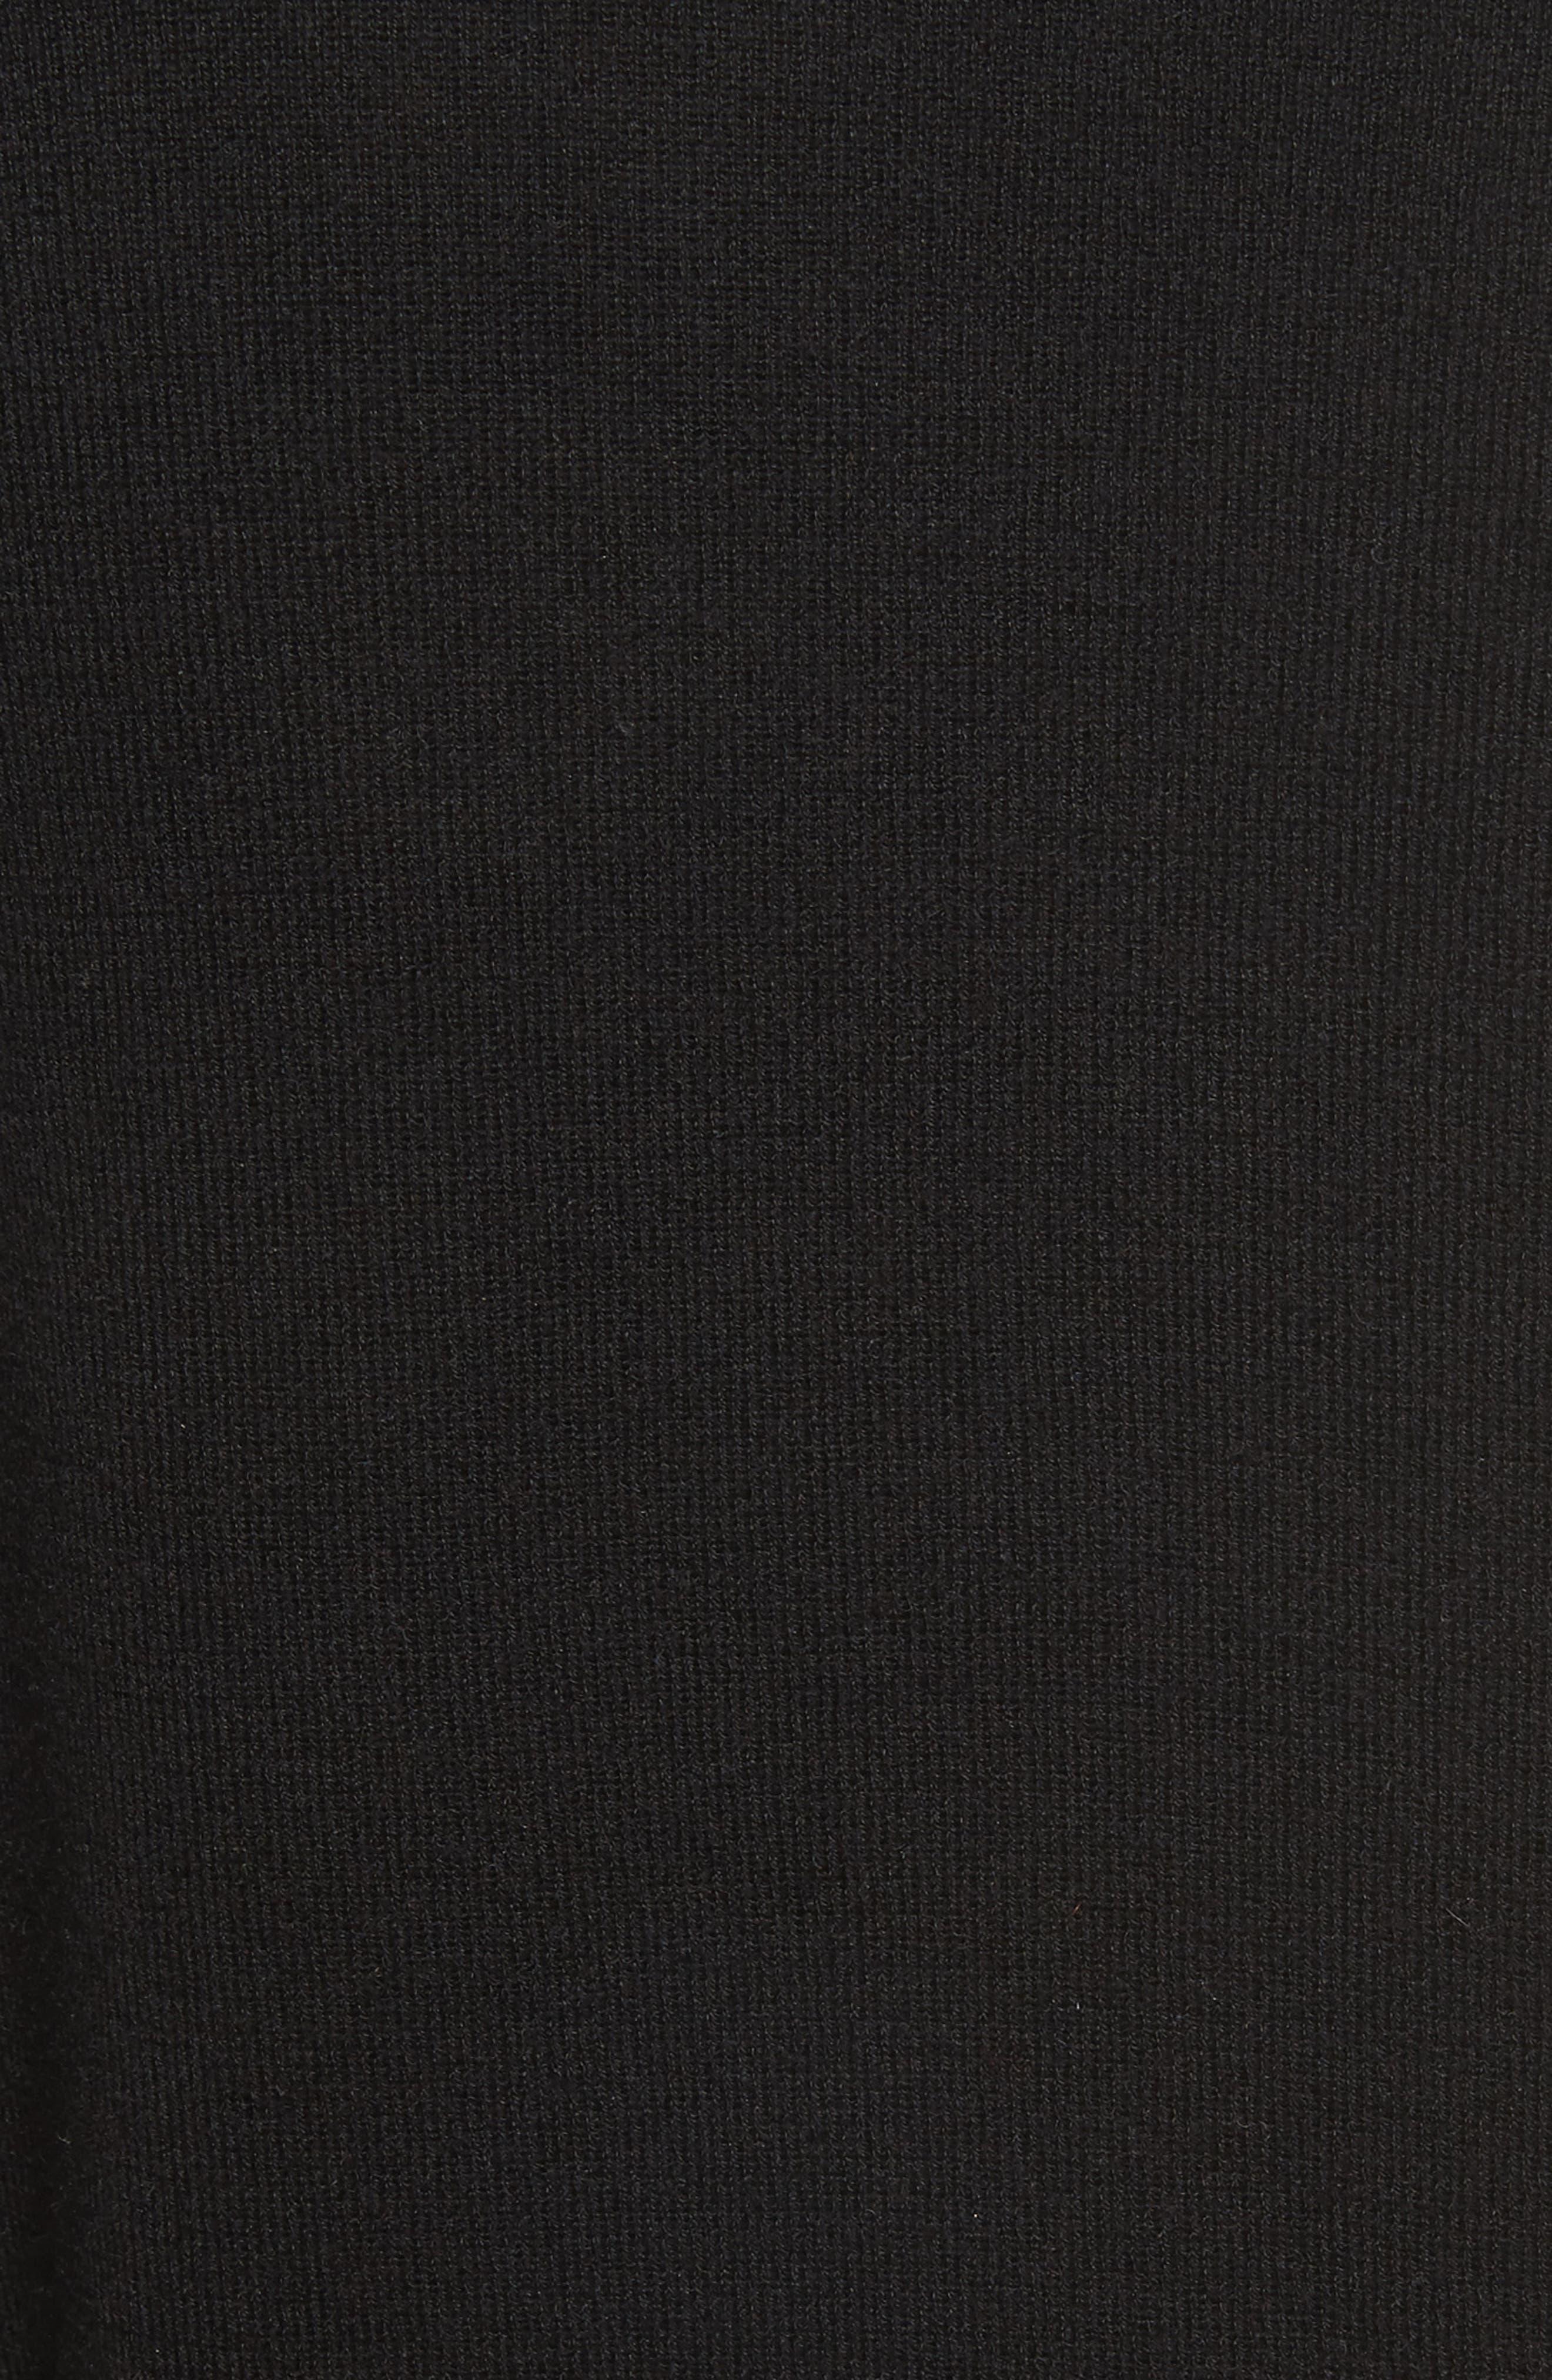 Choker Collar Silk Blend Sweater,                             Alternate thumbnail 5, color,                             001